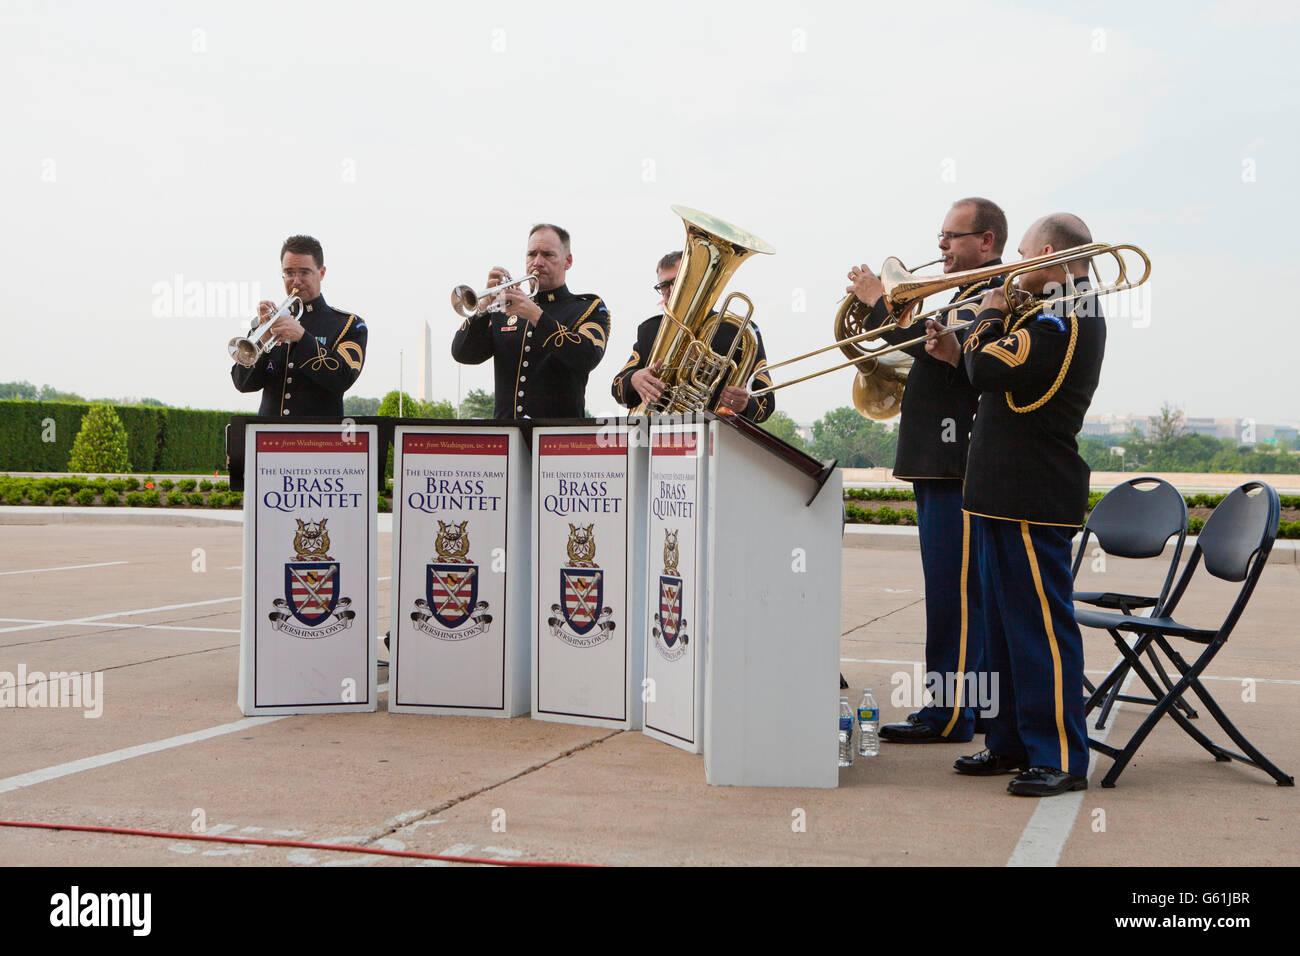 The United States Army Brass Quintet  - Washington, DC USA - Stock Image